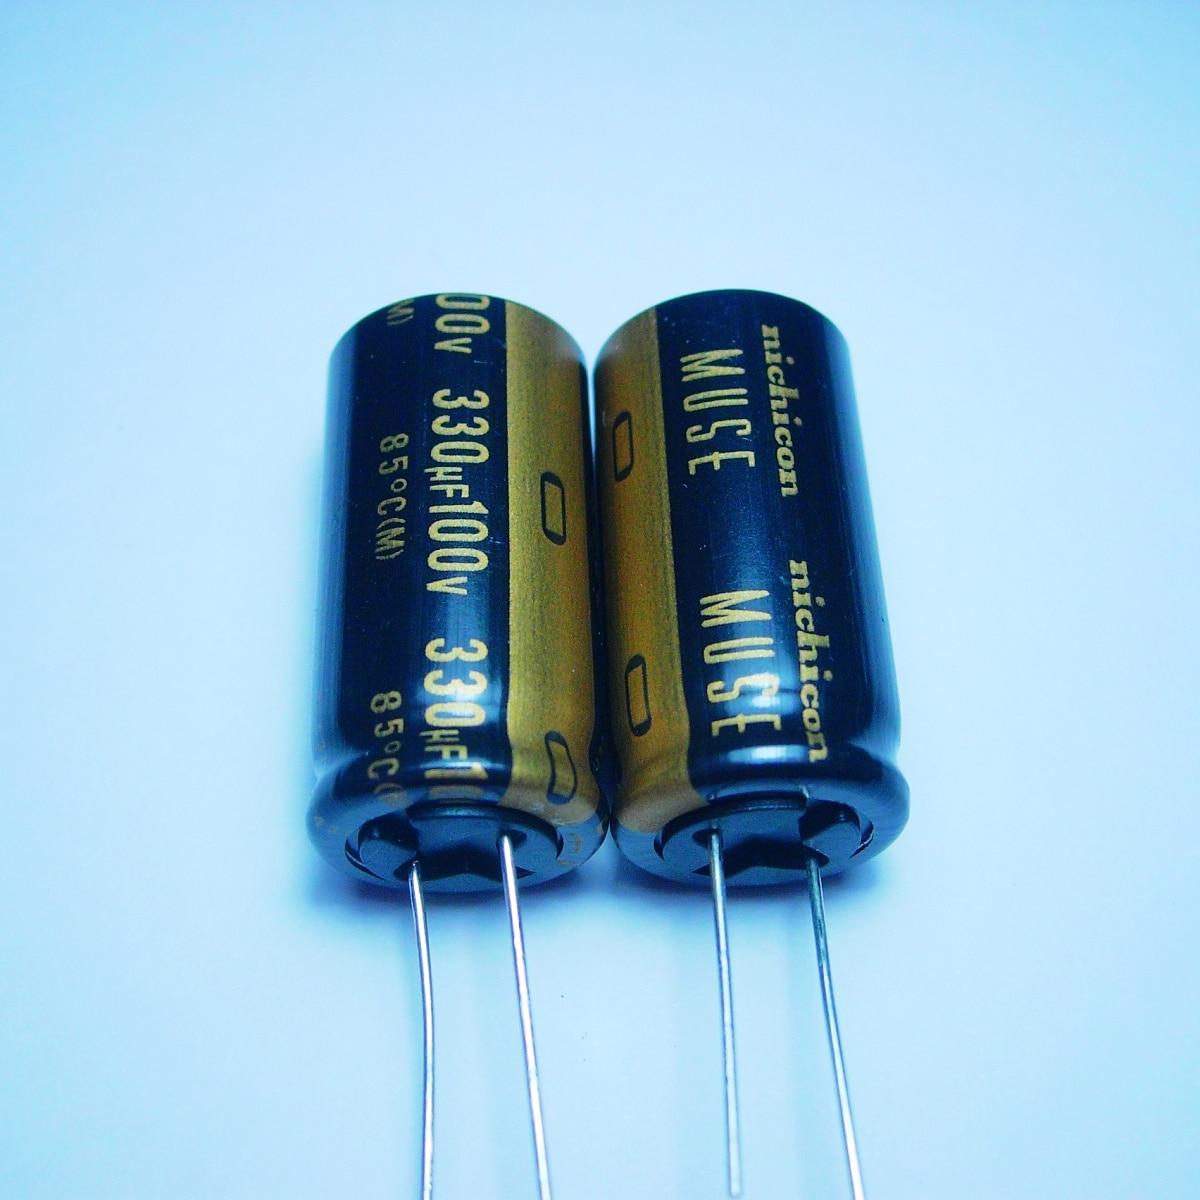 10 шт/20 шт оригинальные nichicon 330 мкФ/100v 18*36 MUSE KZ аудио супер конденсатор